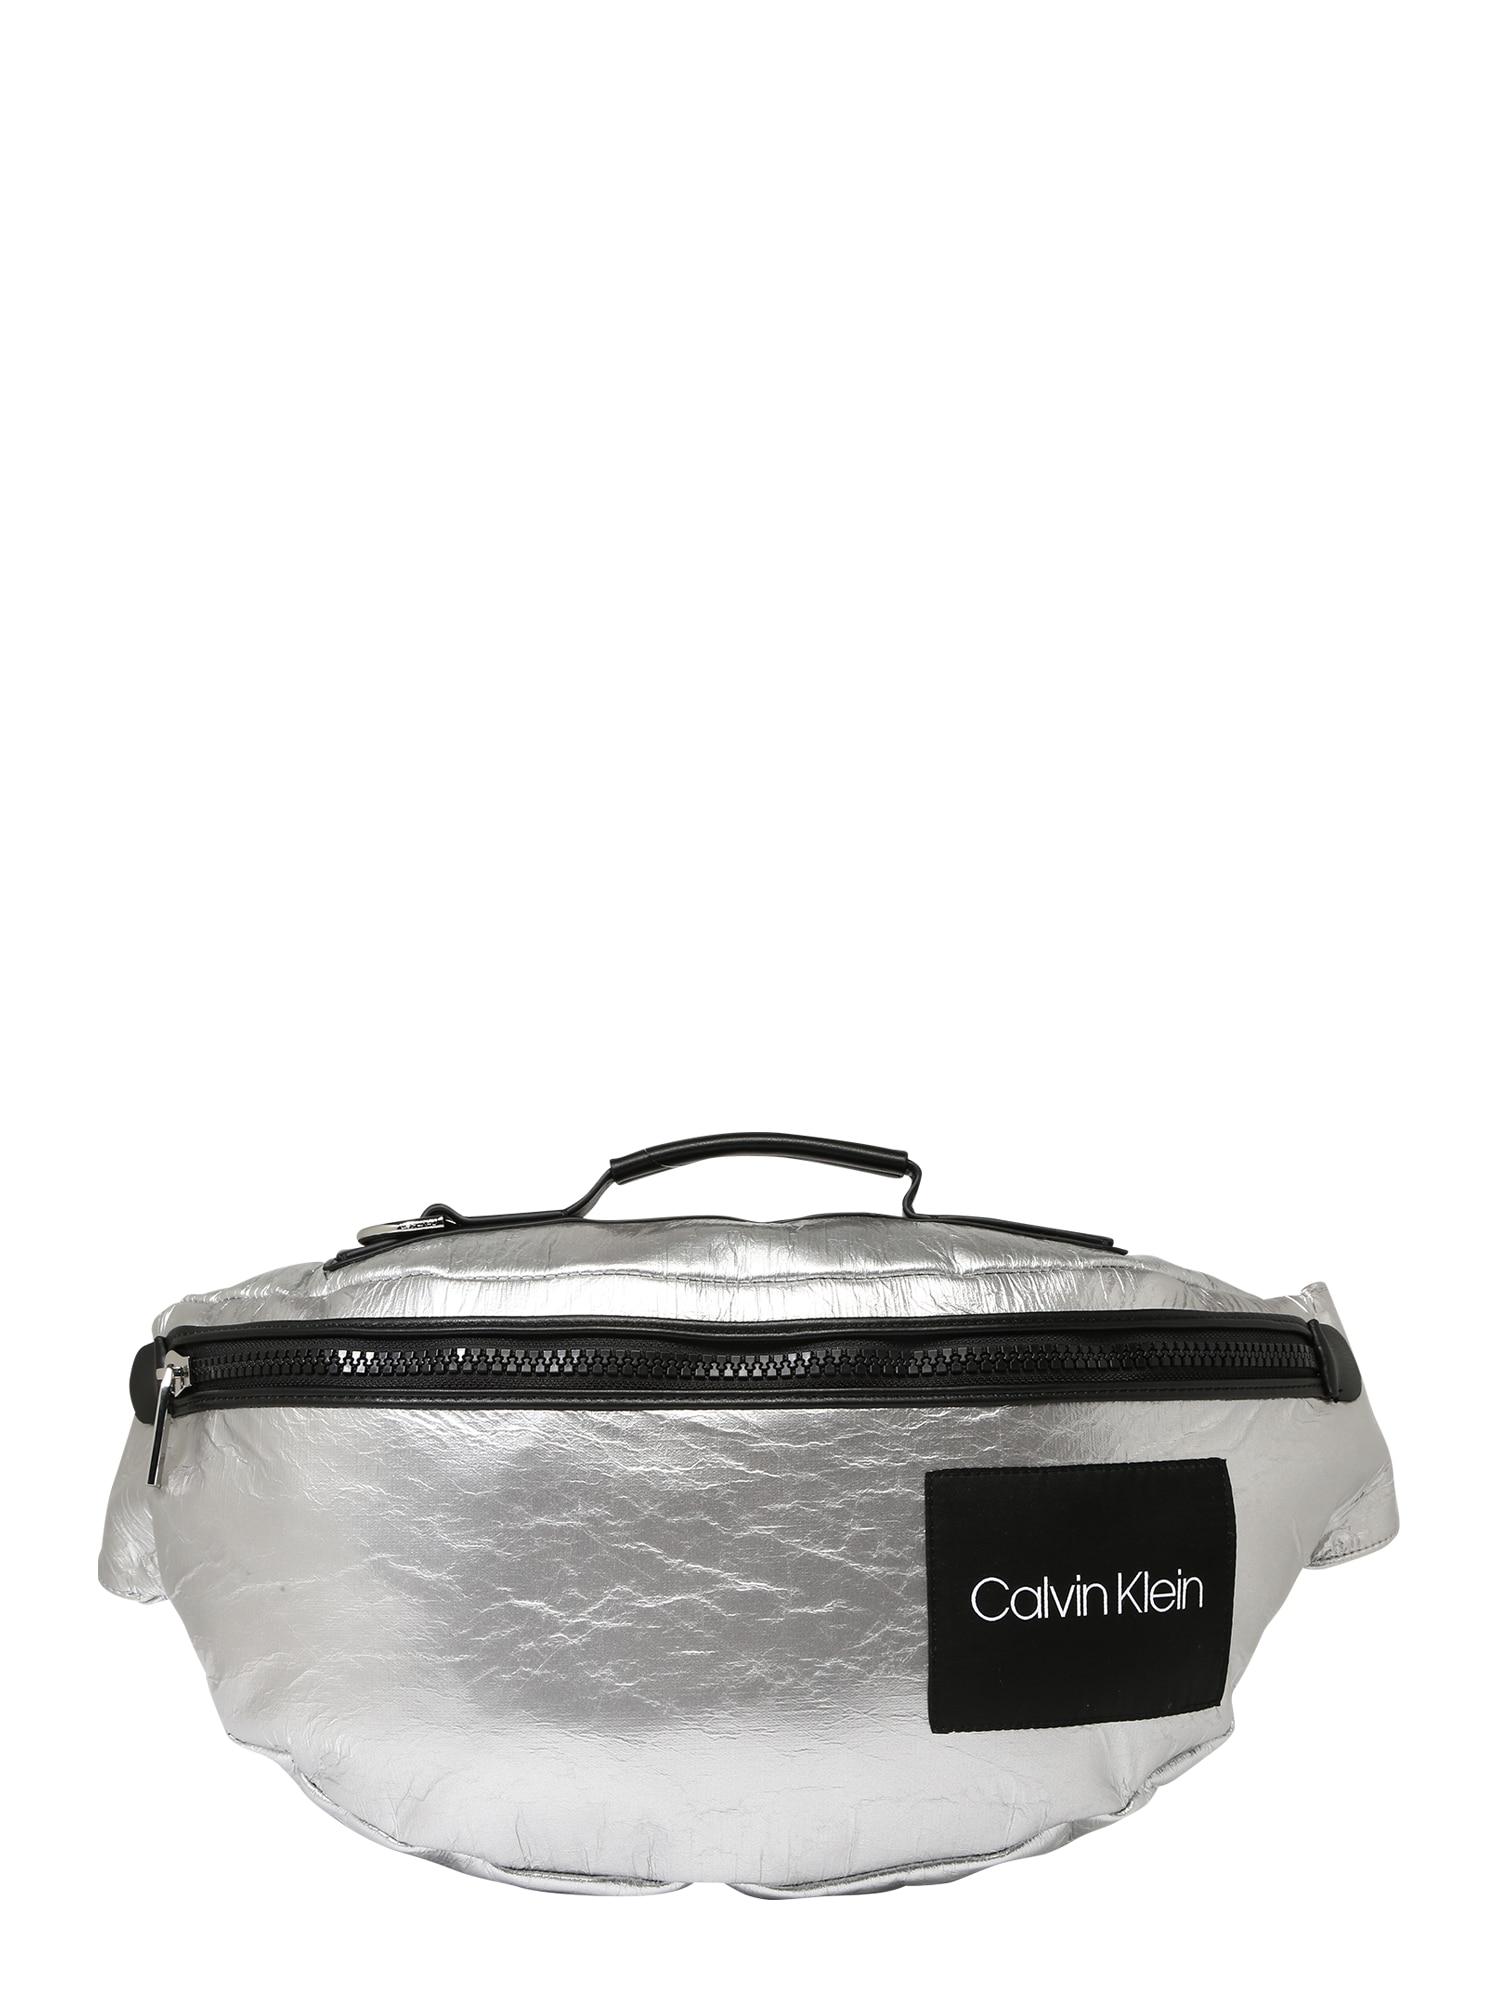 Taška přes rameno ITEM URBAN CROSSBODY černá stříbrná Calvin Klein